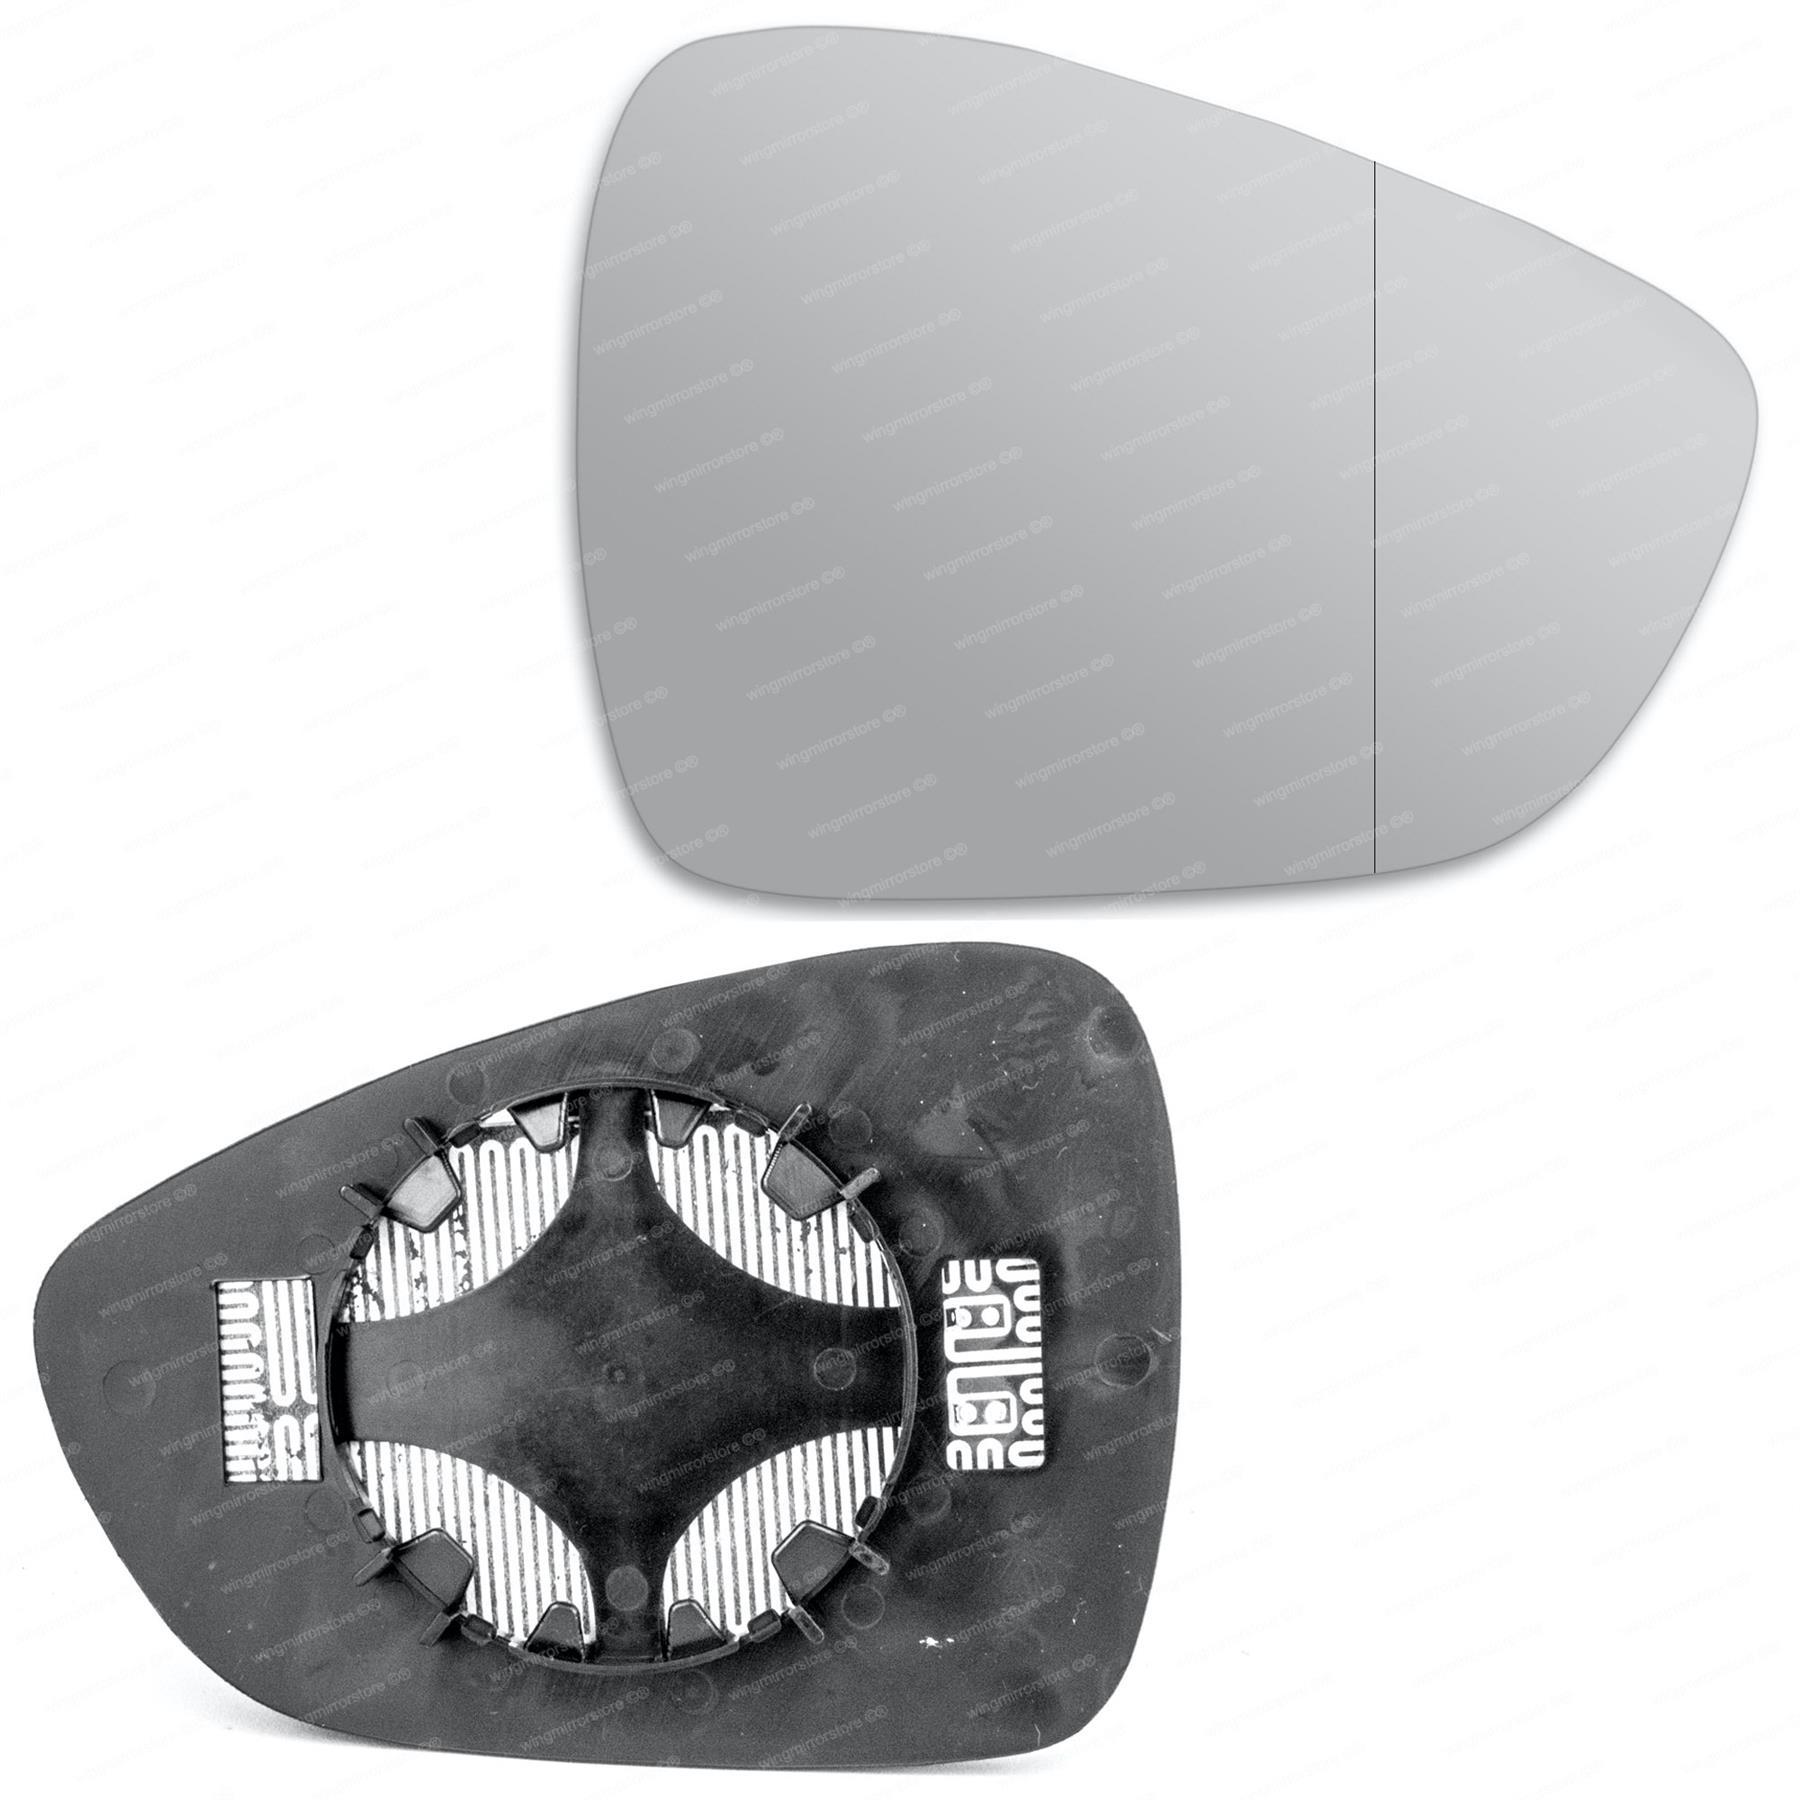 Cristal espejo de ala izquierda del lado del pasajero para Citroen C1 2014-2020 GRAN ANGULAR CLIMATIZADA